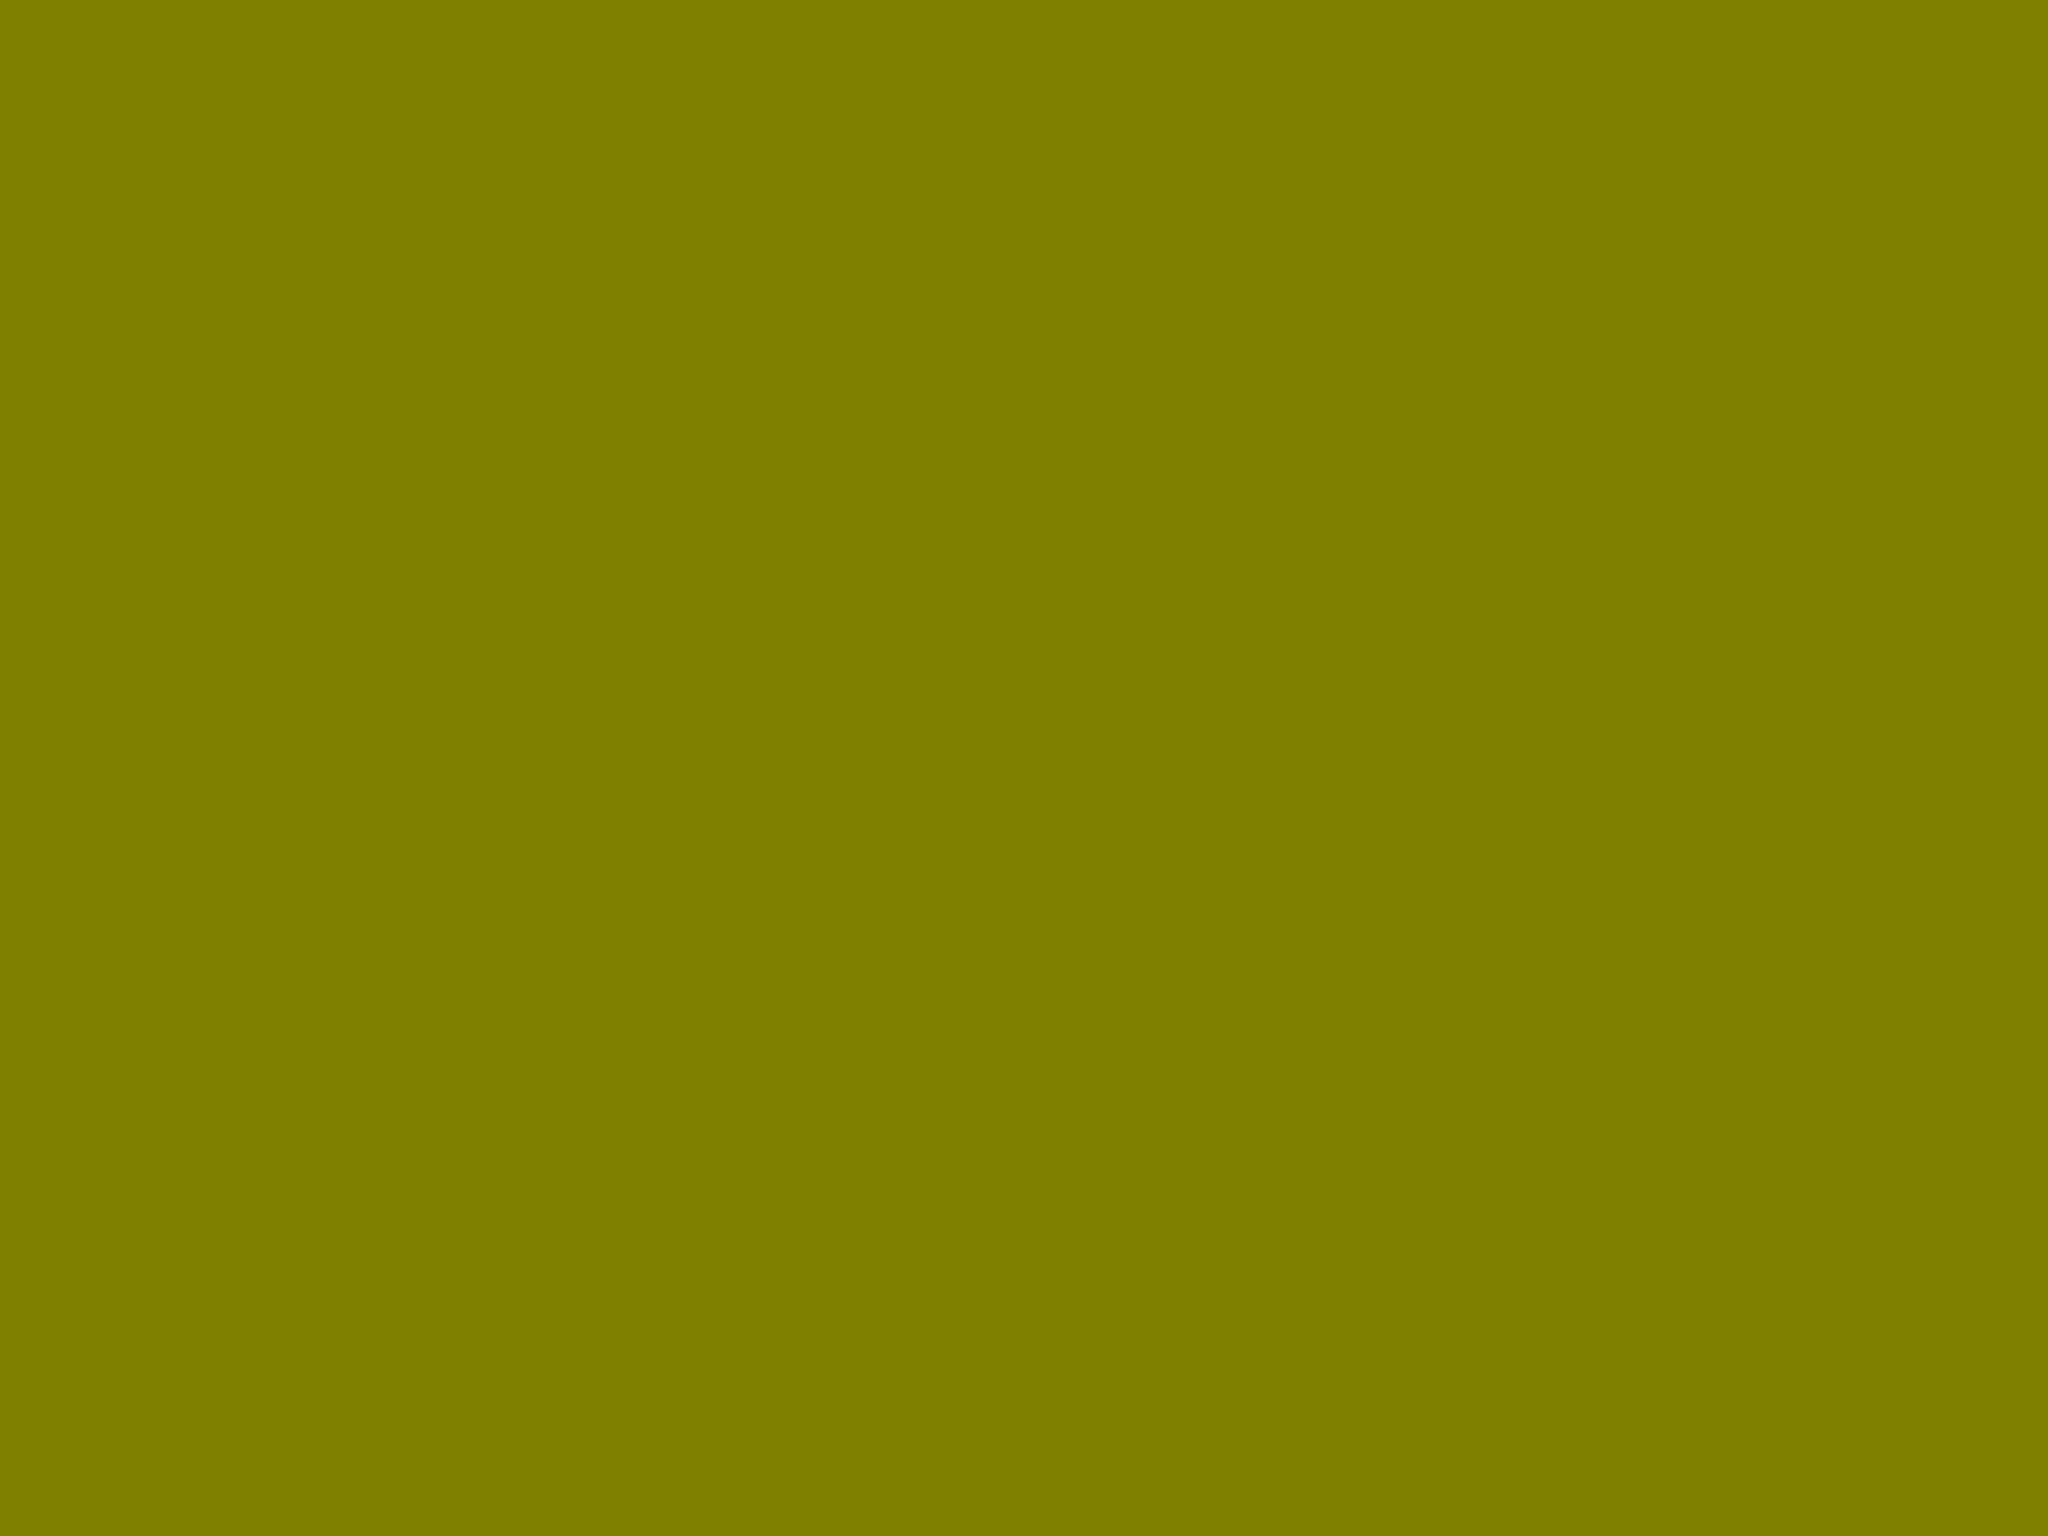 2048x1536 Olive Solid Color Background